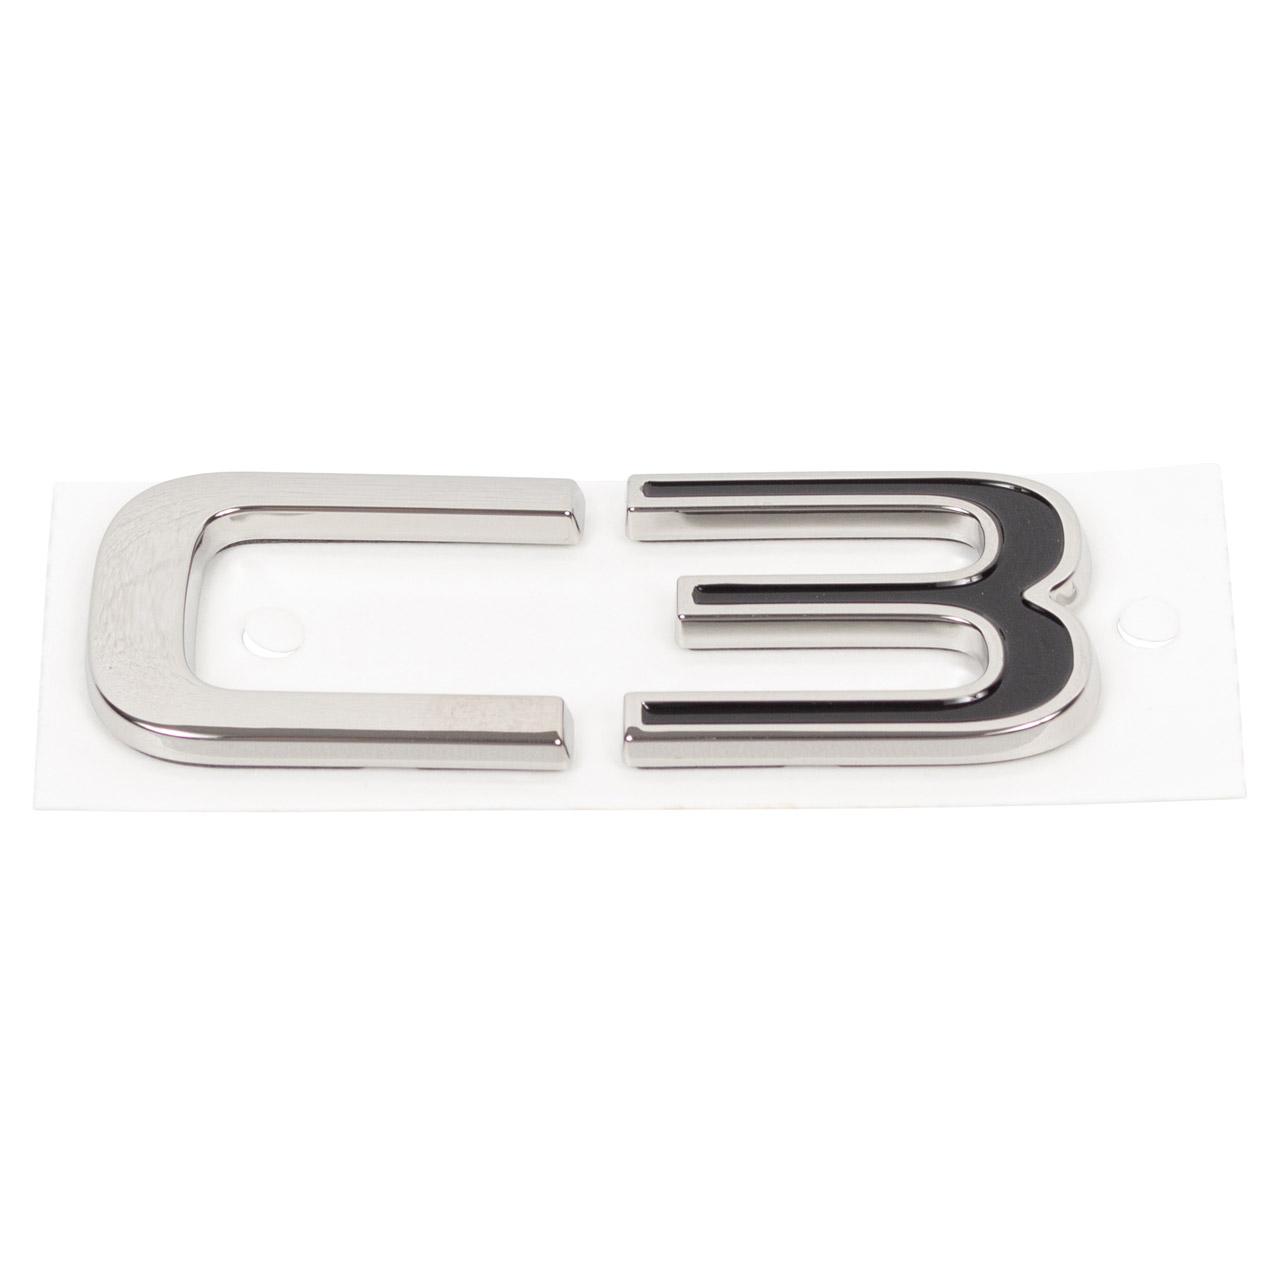 ORIGINAL Citroen Emblem Logo Schriftzug Fahrzeugheckklappe C3 Aircross 2 YQ00162180